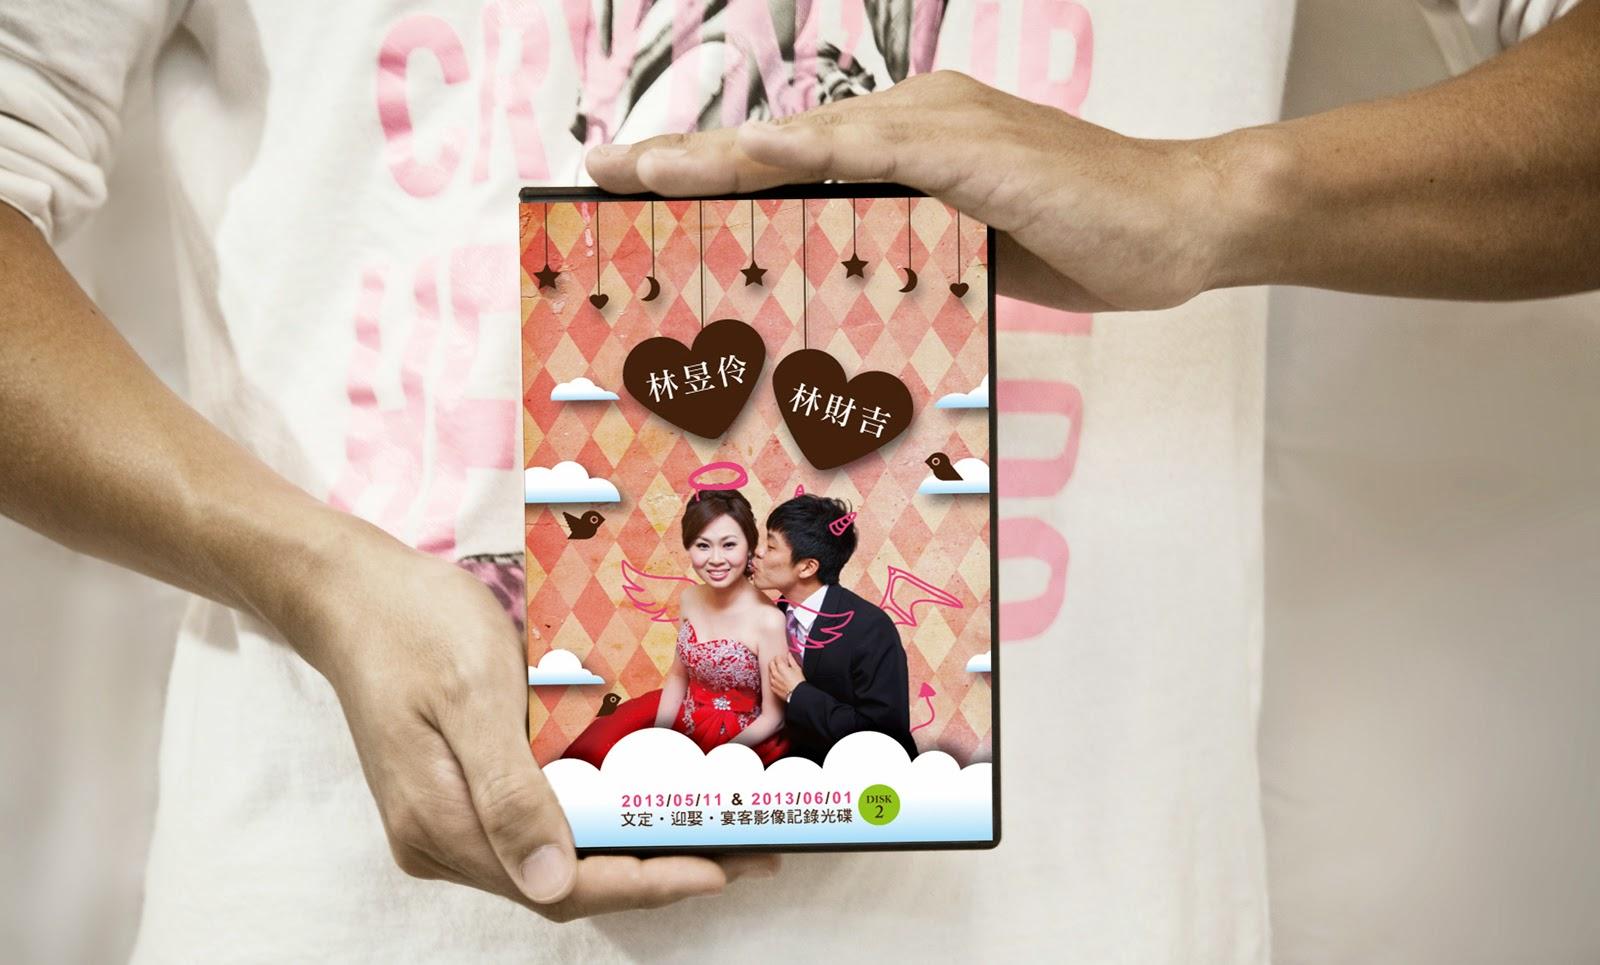 SHOWCASE作品展示 |  財吉×昱伶婚攝DVD封面設計 by MUMULab.com